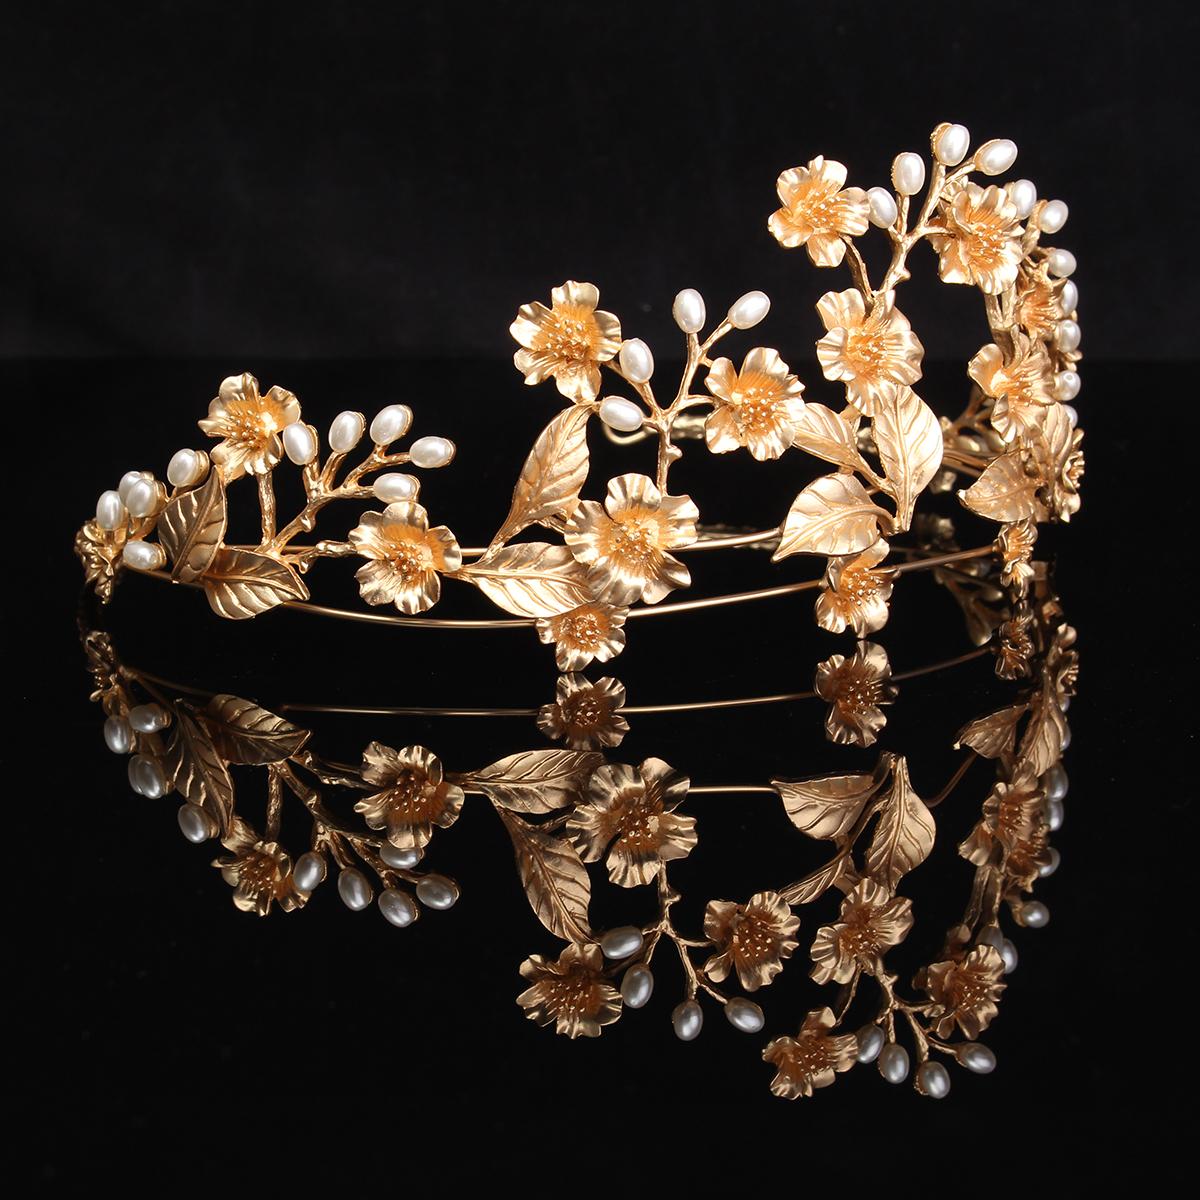 Bride Flower Leaf Bead Gold Metal Queen Crown Tiara Bridal Wedding Headpiece Headband